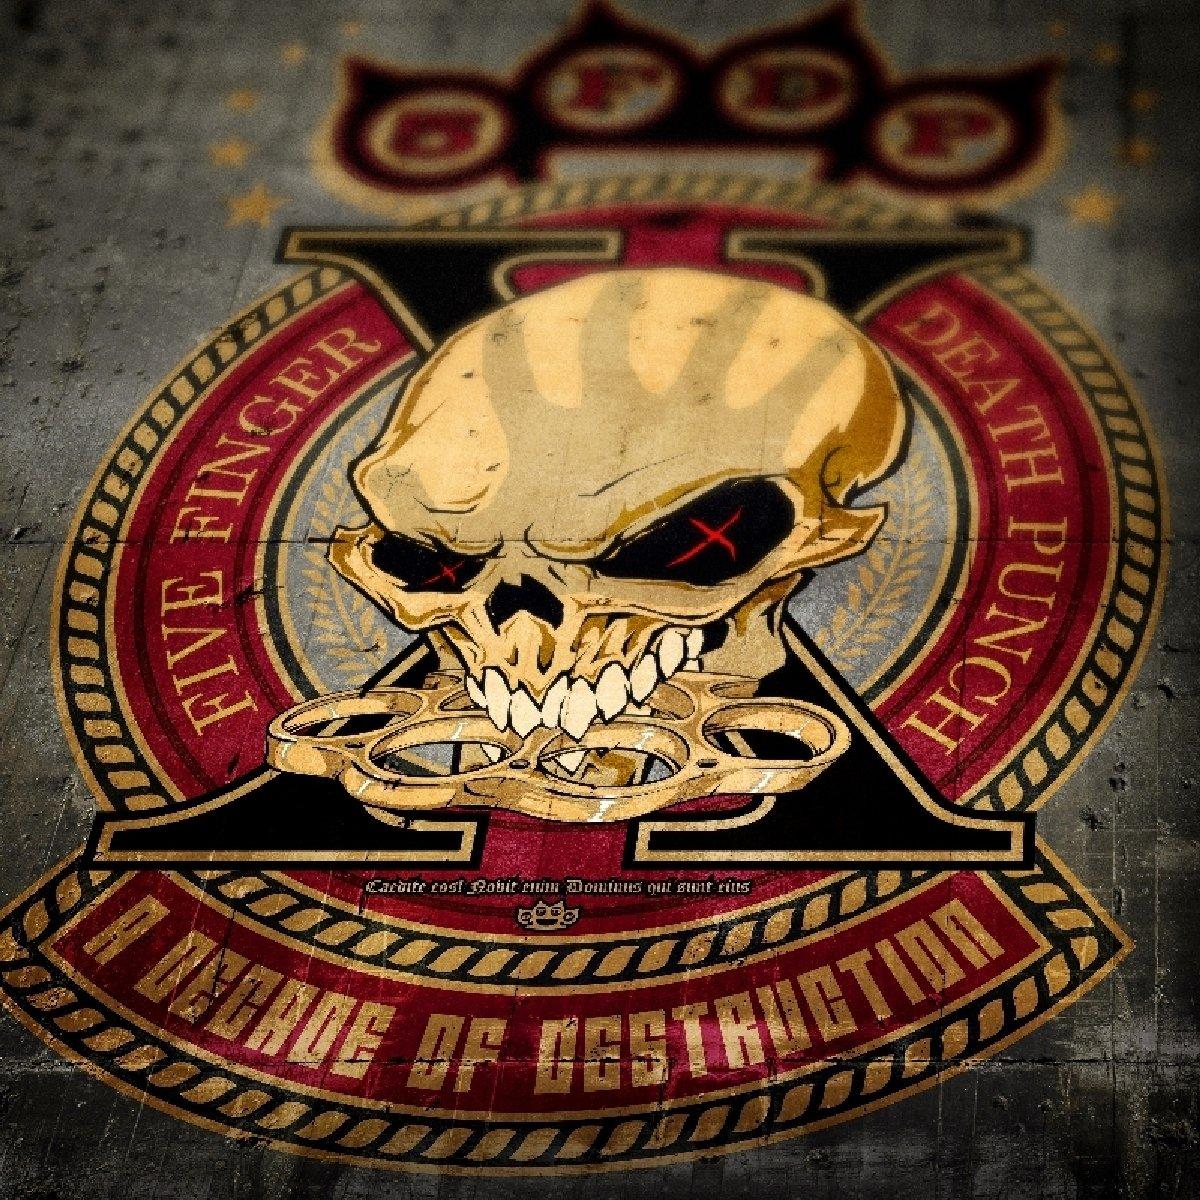 five finger death punch a decade of destruction free download